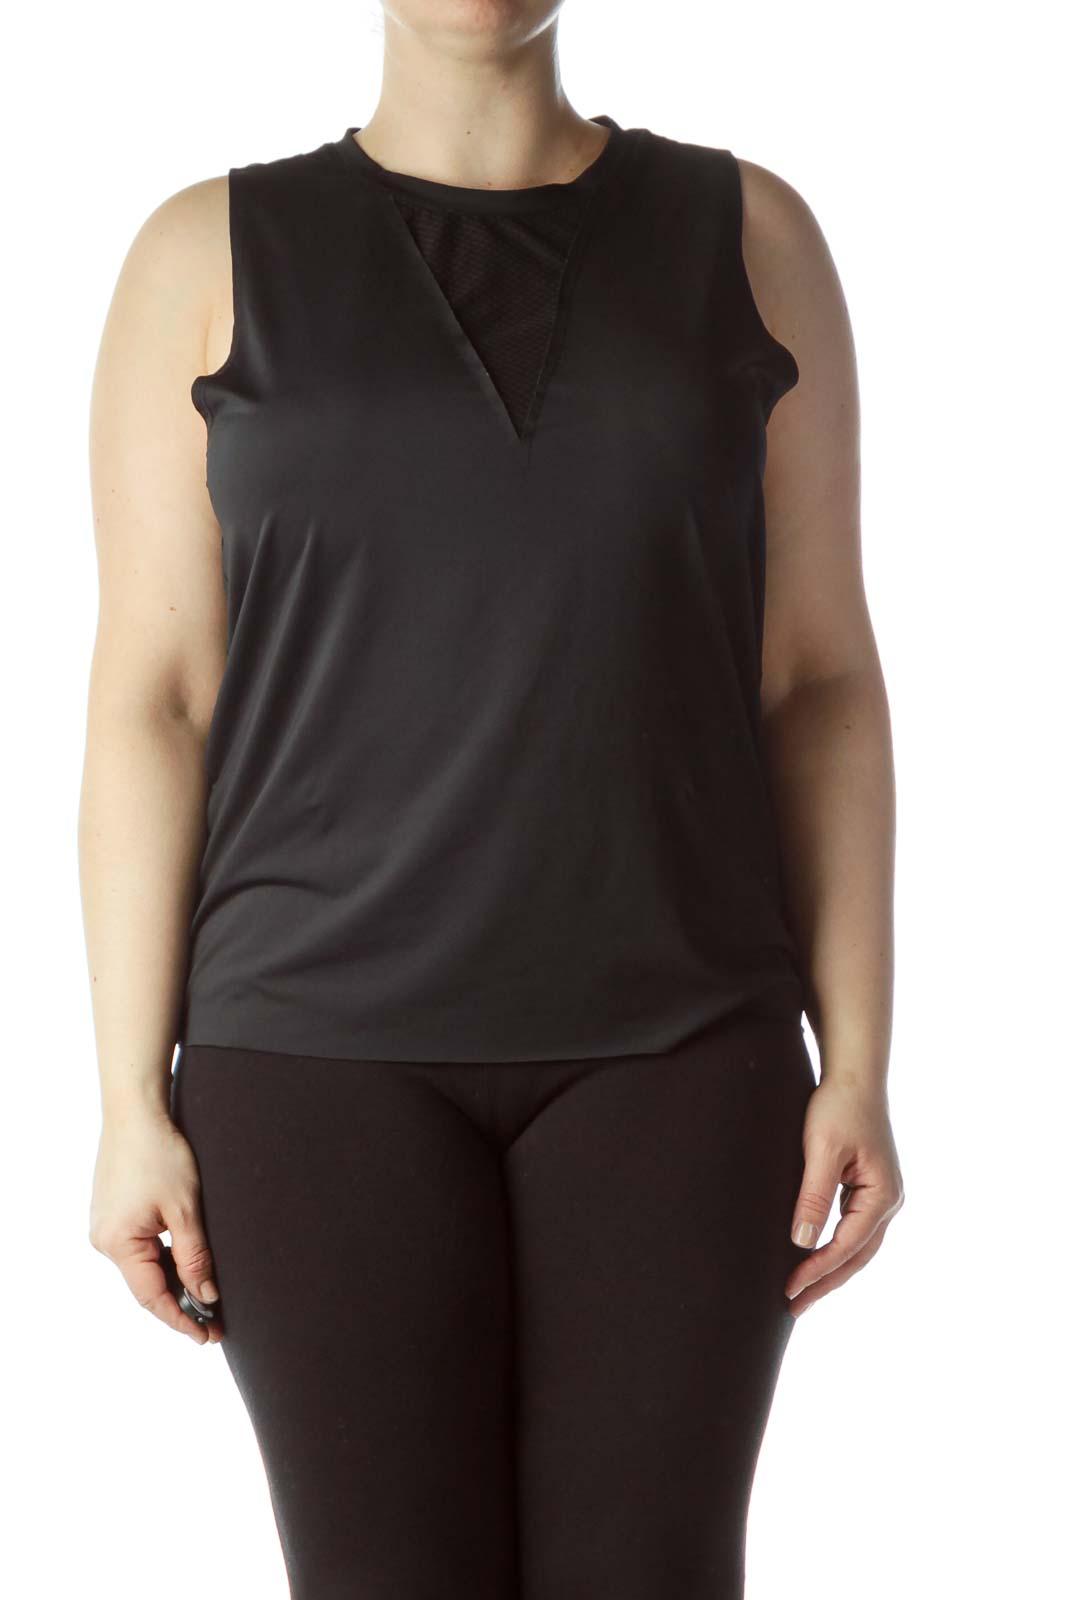 Black Round Neck Sleeveless Yoga Top Front